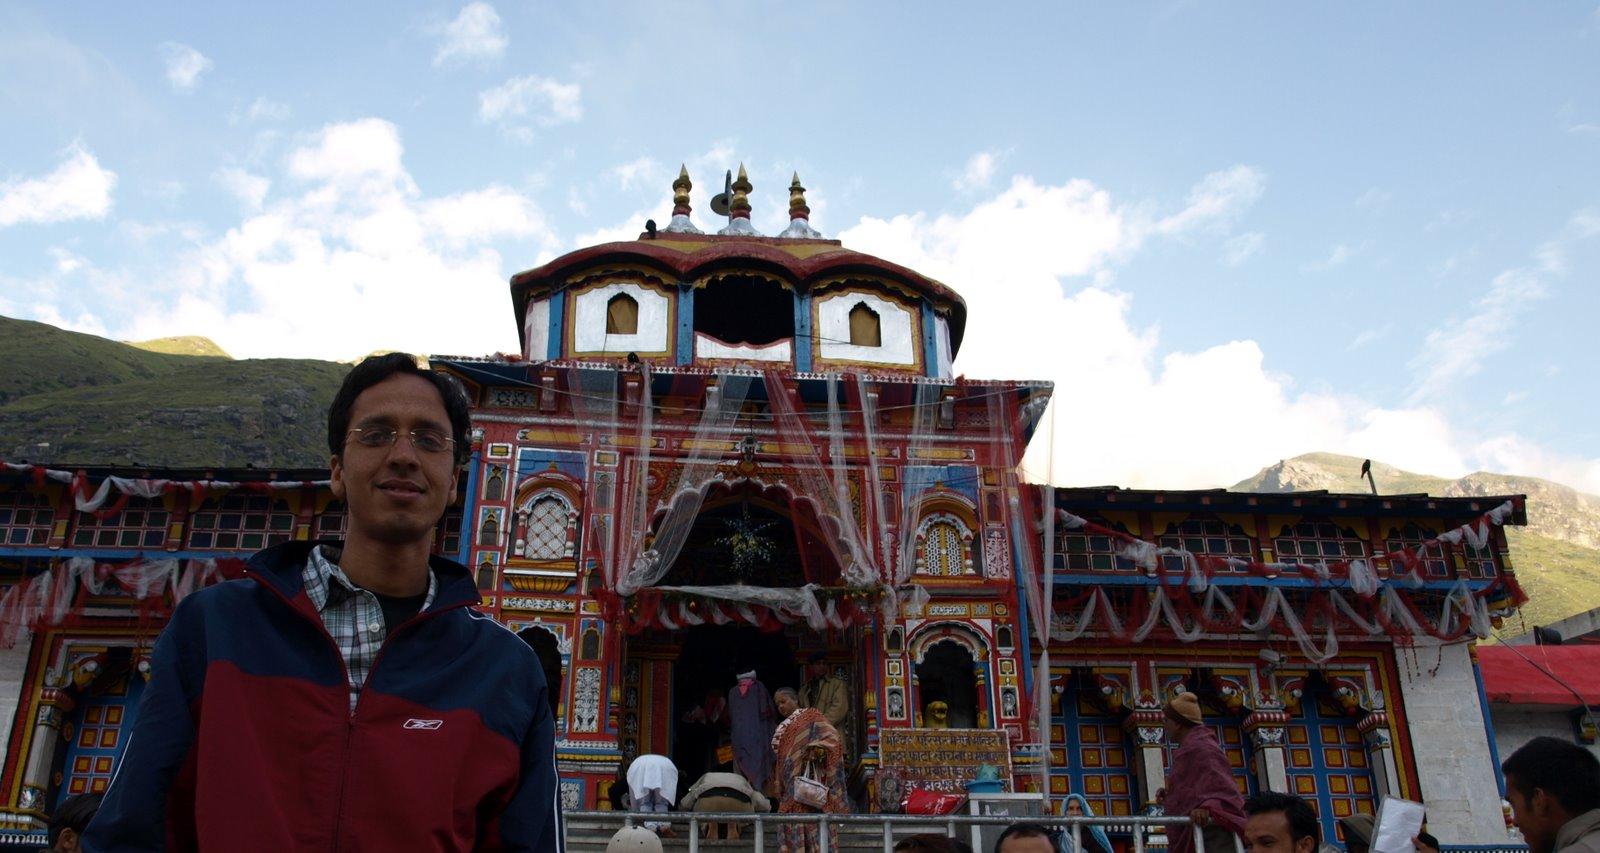 Photo: Pankaj with Badrinath temple